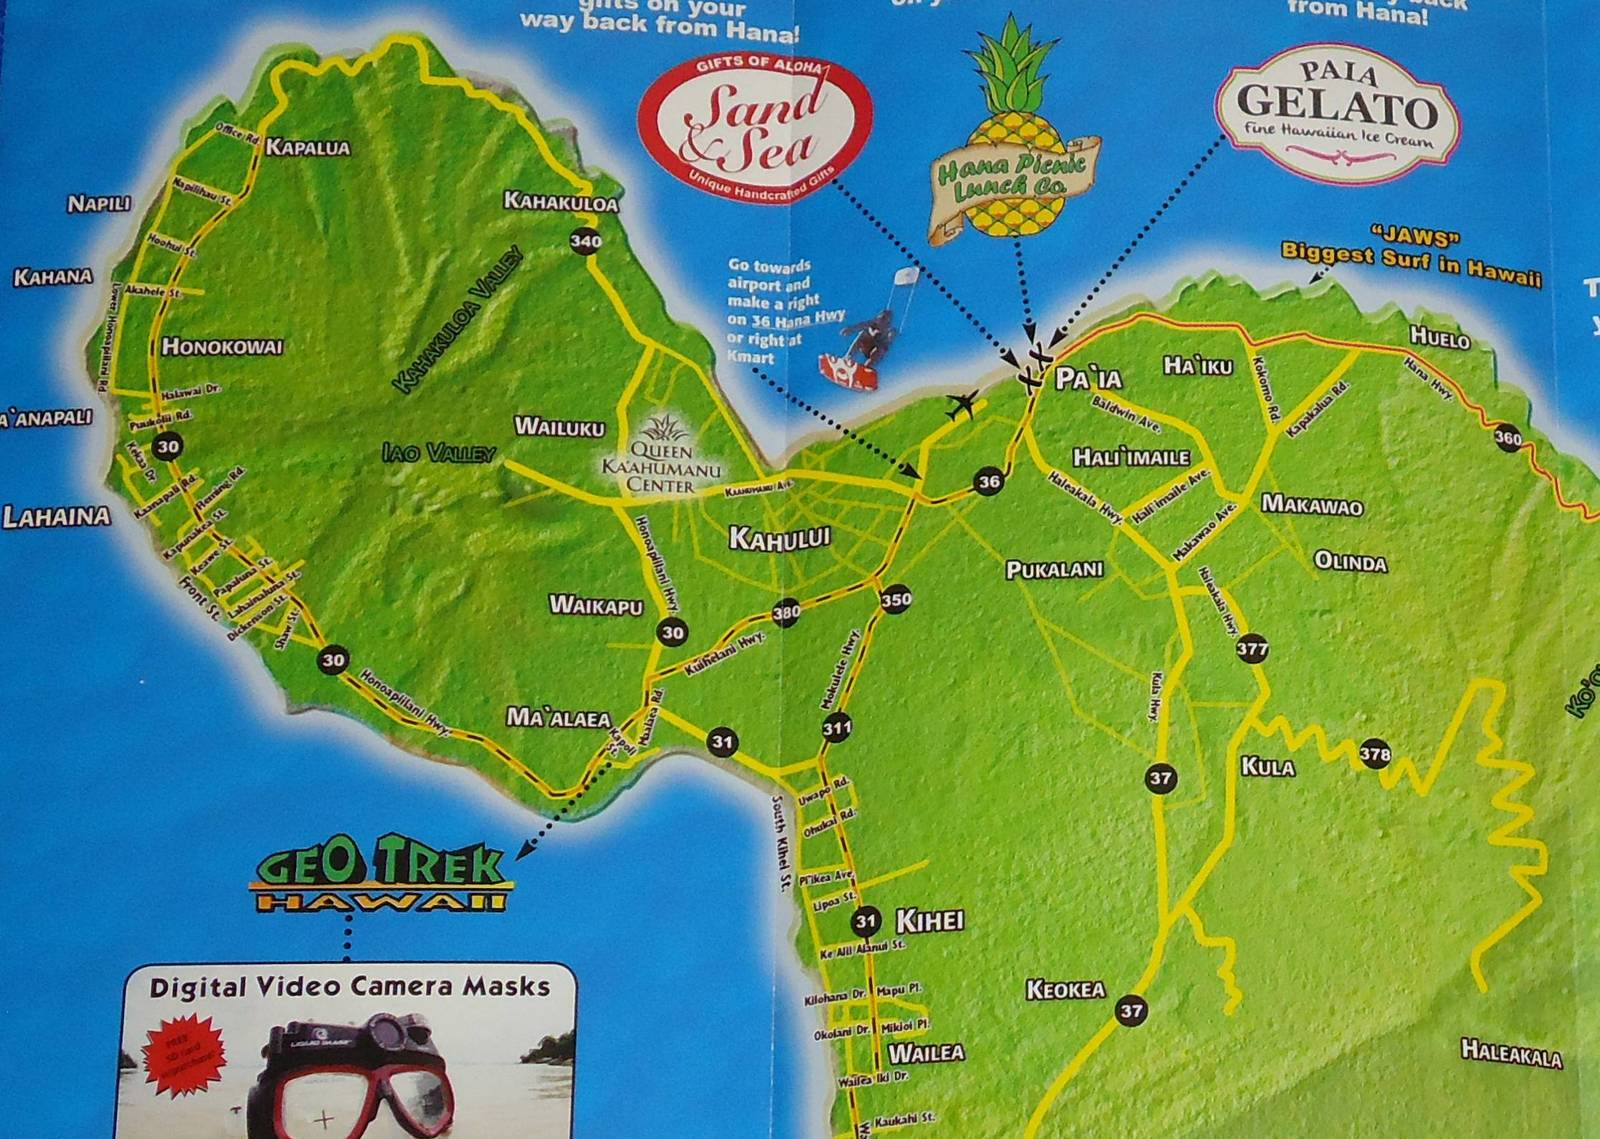 Informative Road To Hana Souvenir Map Maui and 50 similar items on waikiki map, lahaina map, molokai map, reno map, puerto rico map, oahu map, kapalua map, miami map, lihue map, makawao map, kaanapali map, kihei map, hawaii map, pearl harbor map, kauai map, big island map, honolulu map, hawaiian islands map, lanai map, florida map,